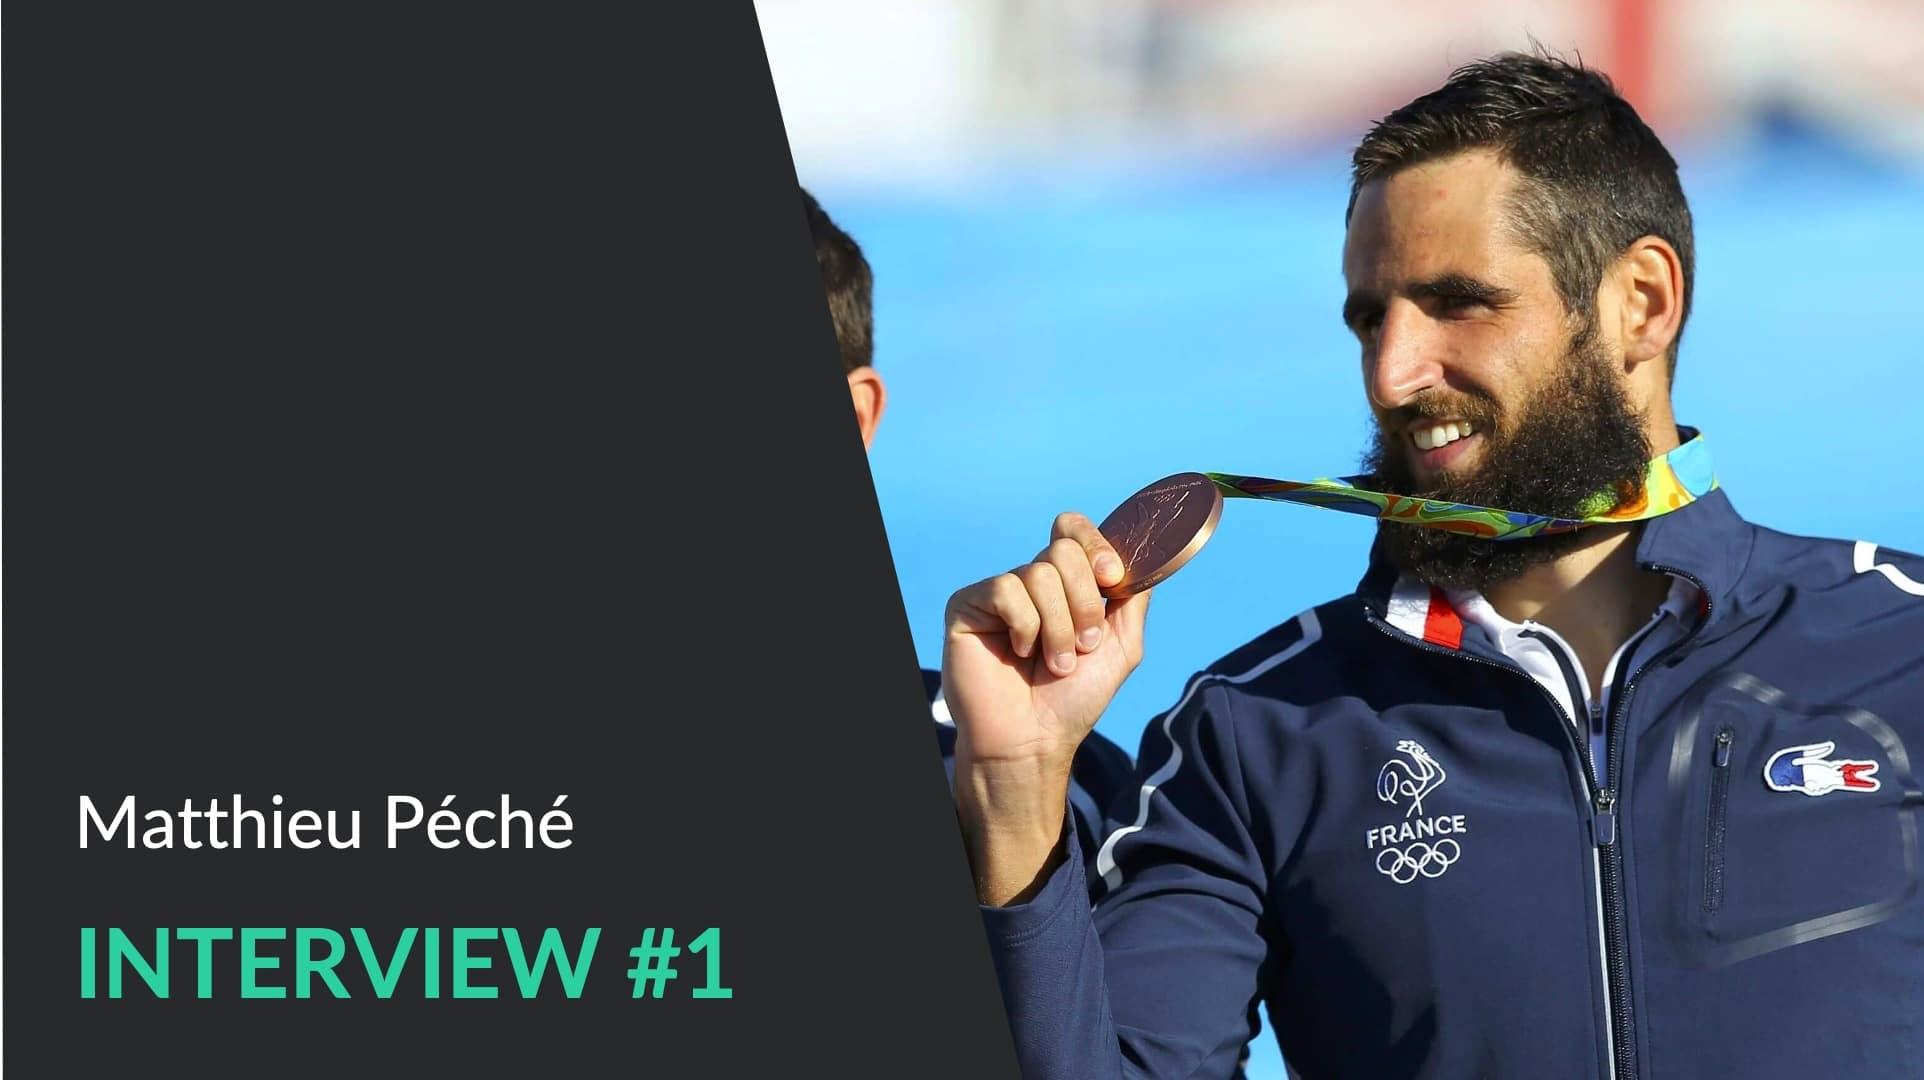 Interview - Matthieu Péché